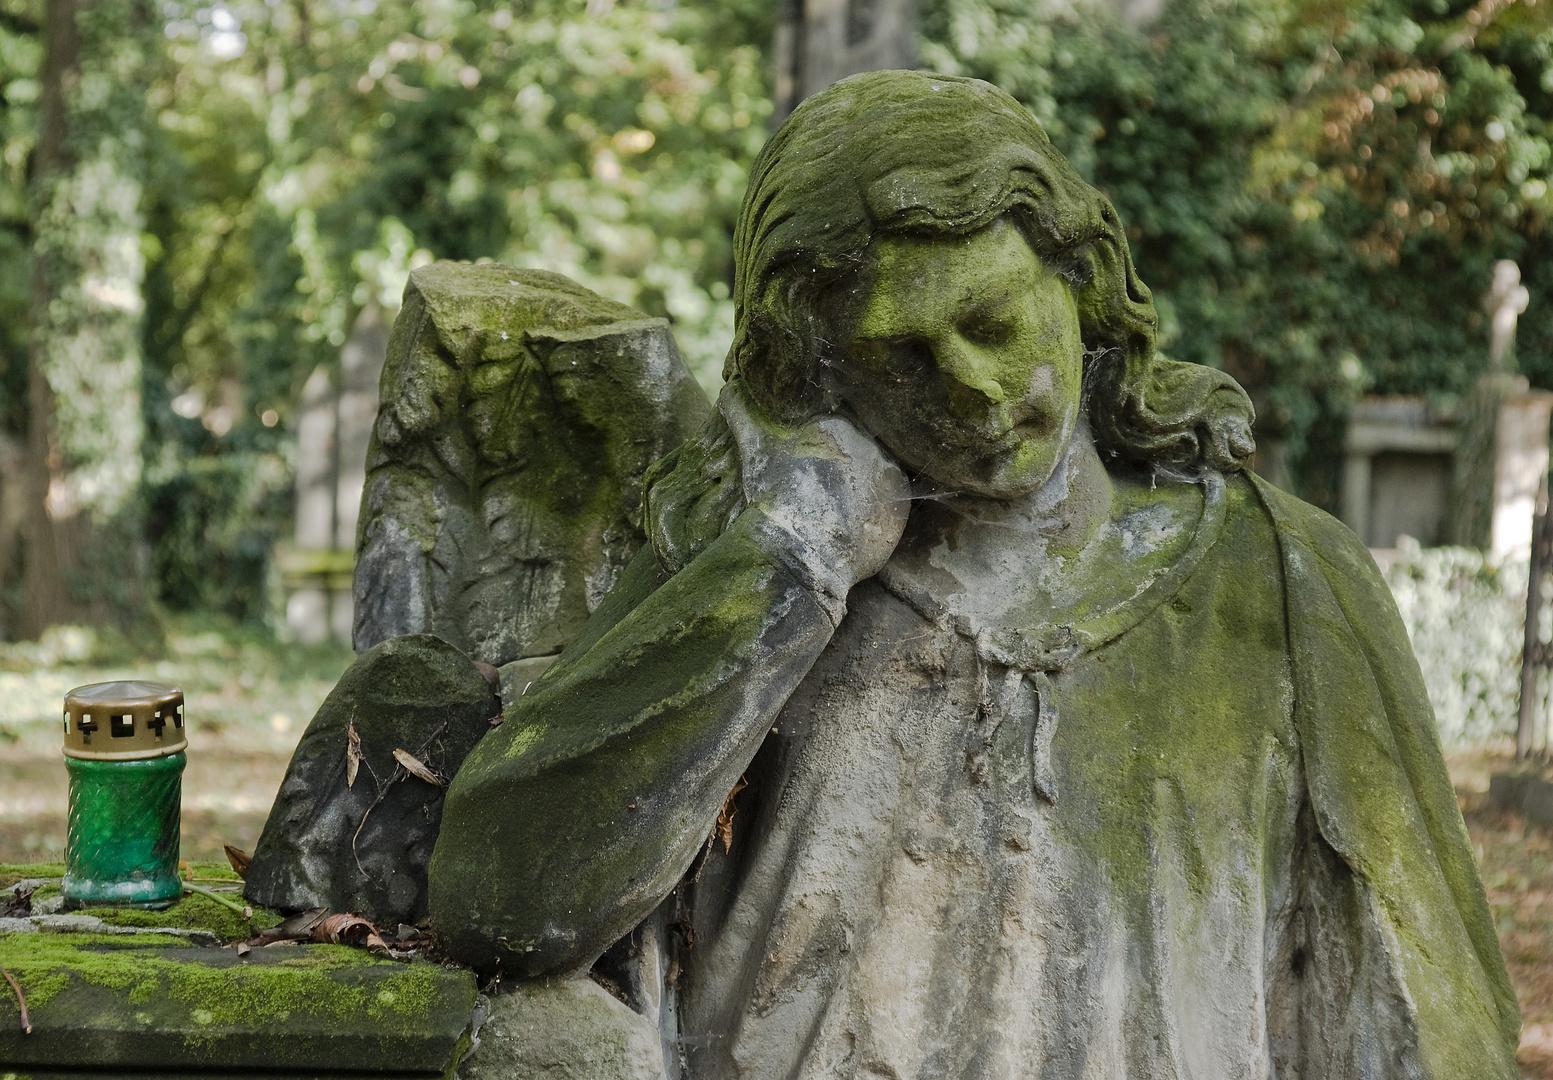 Engel in Grün